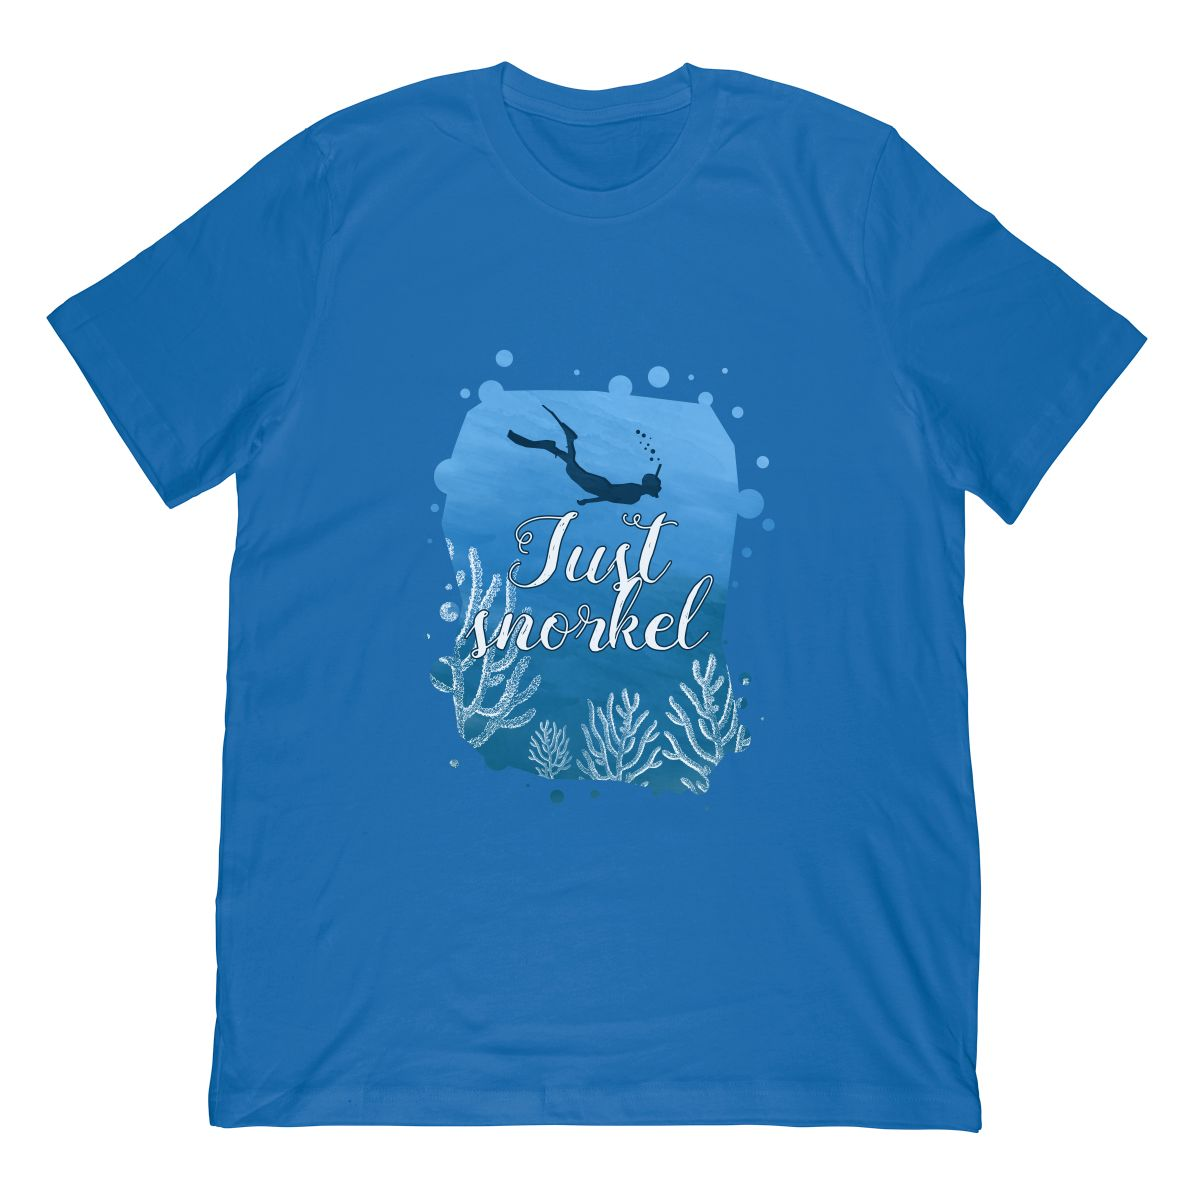 Snorkeling Shirt Just Snorkel